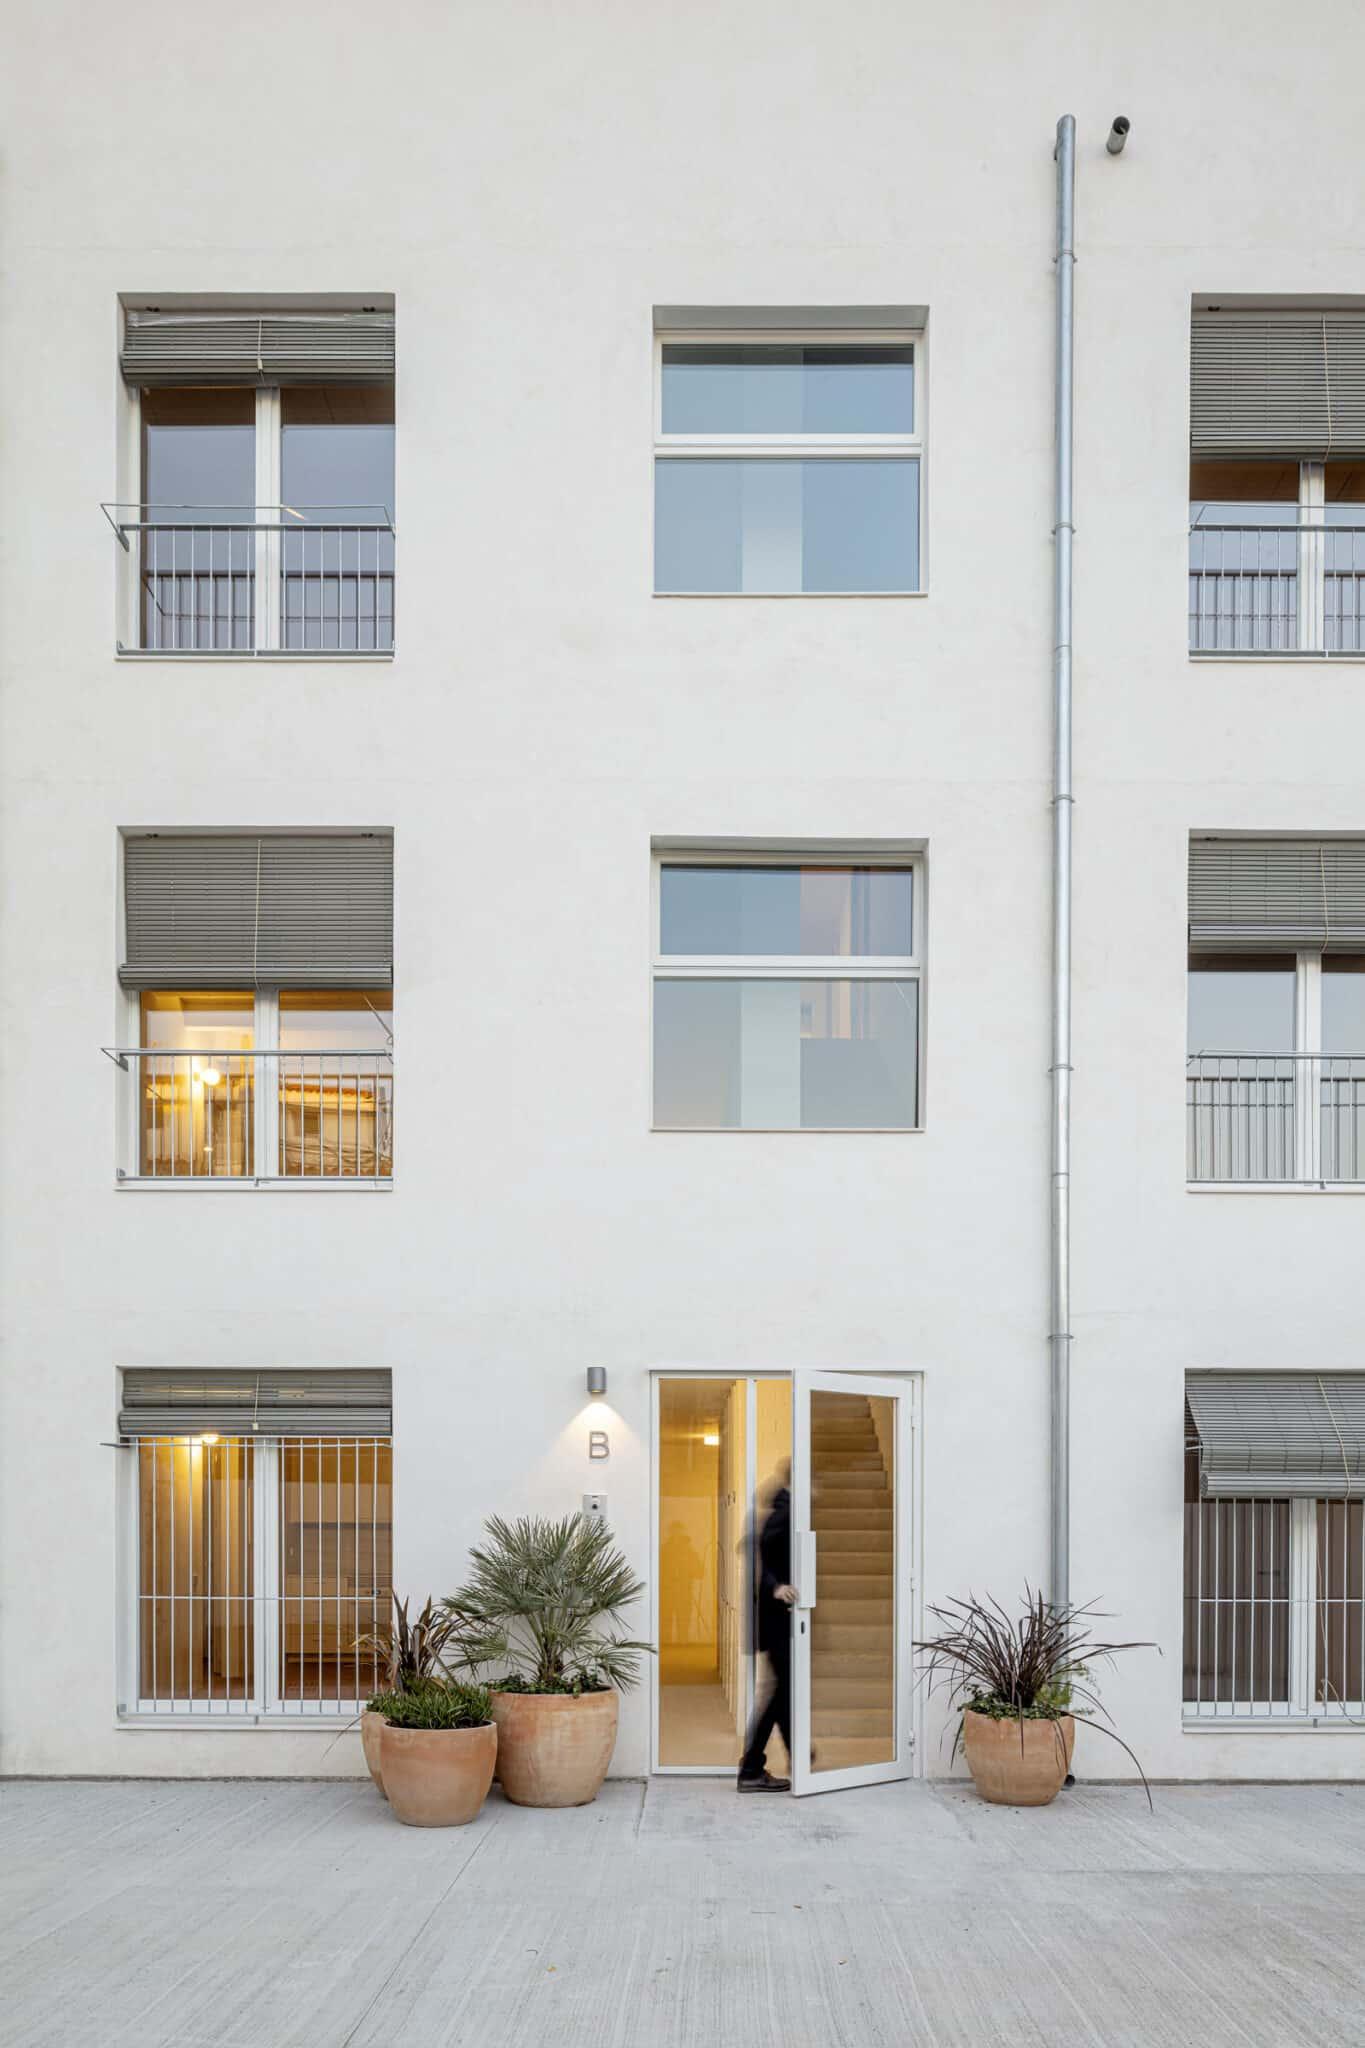 Habitatges Sant Pere de Ribes  - 20210617 DATAAE Habitatges 03.2 37